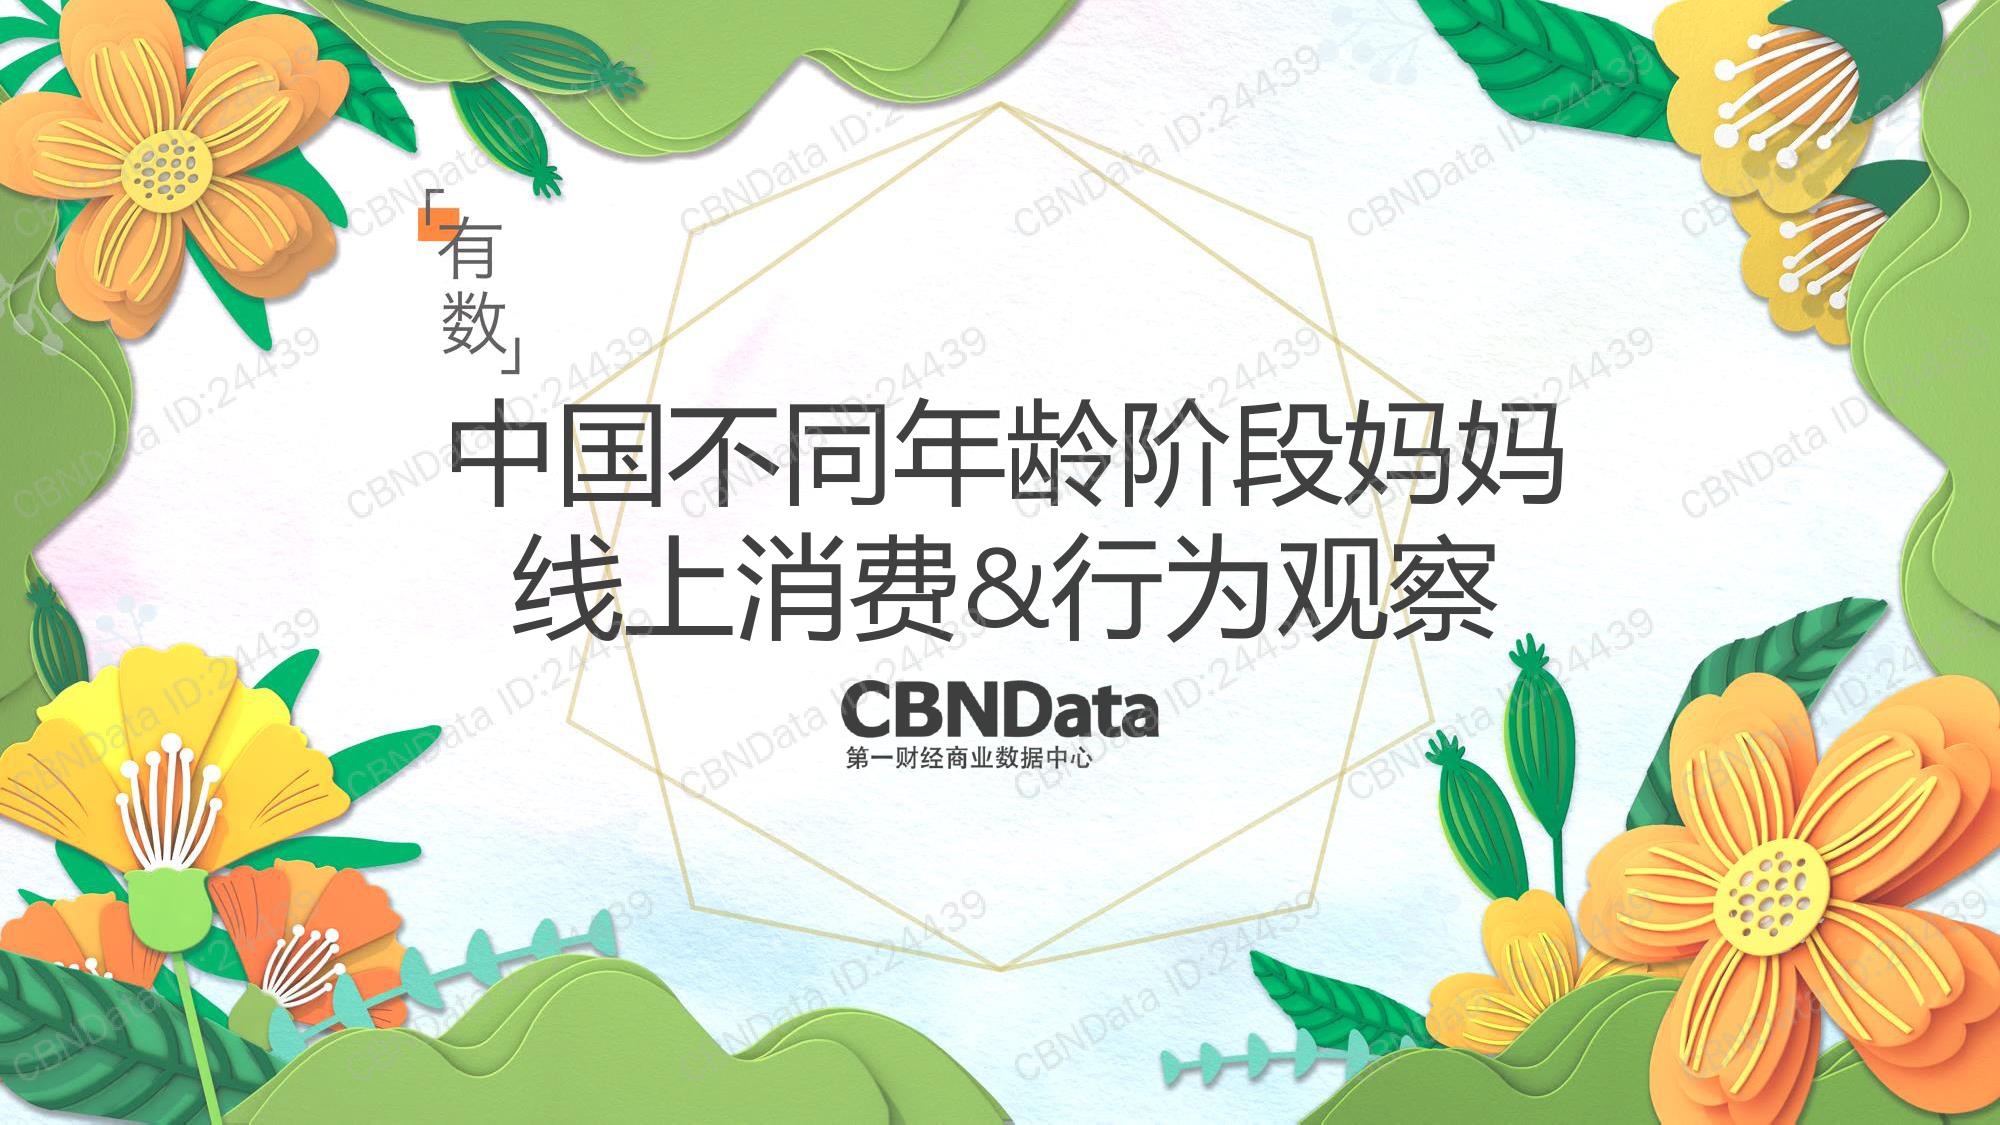 CBNData:2018中国不同年龄段妈妈线上消费&行为观察(附下载)